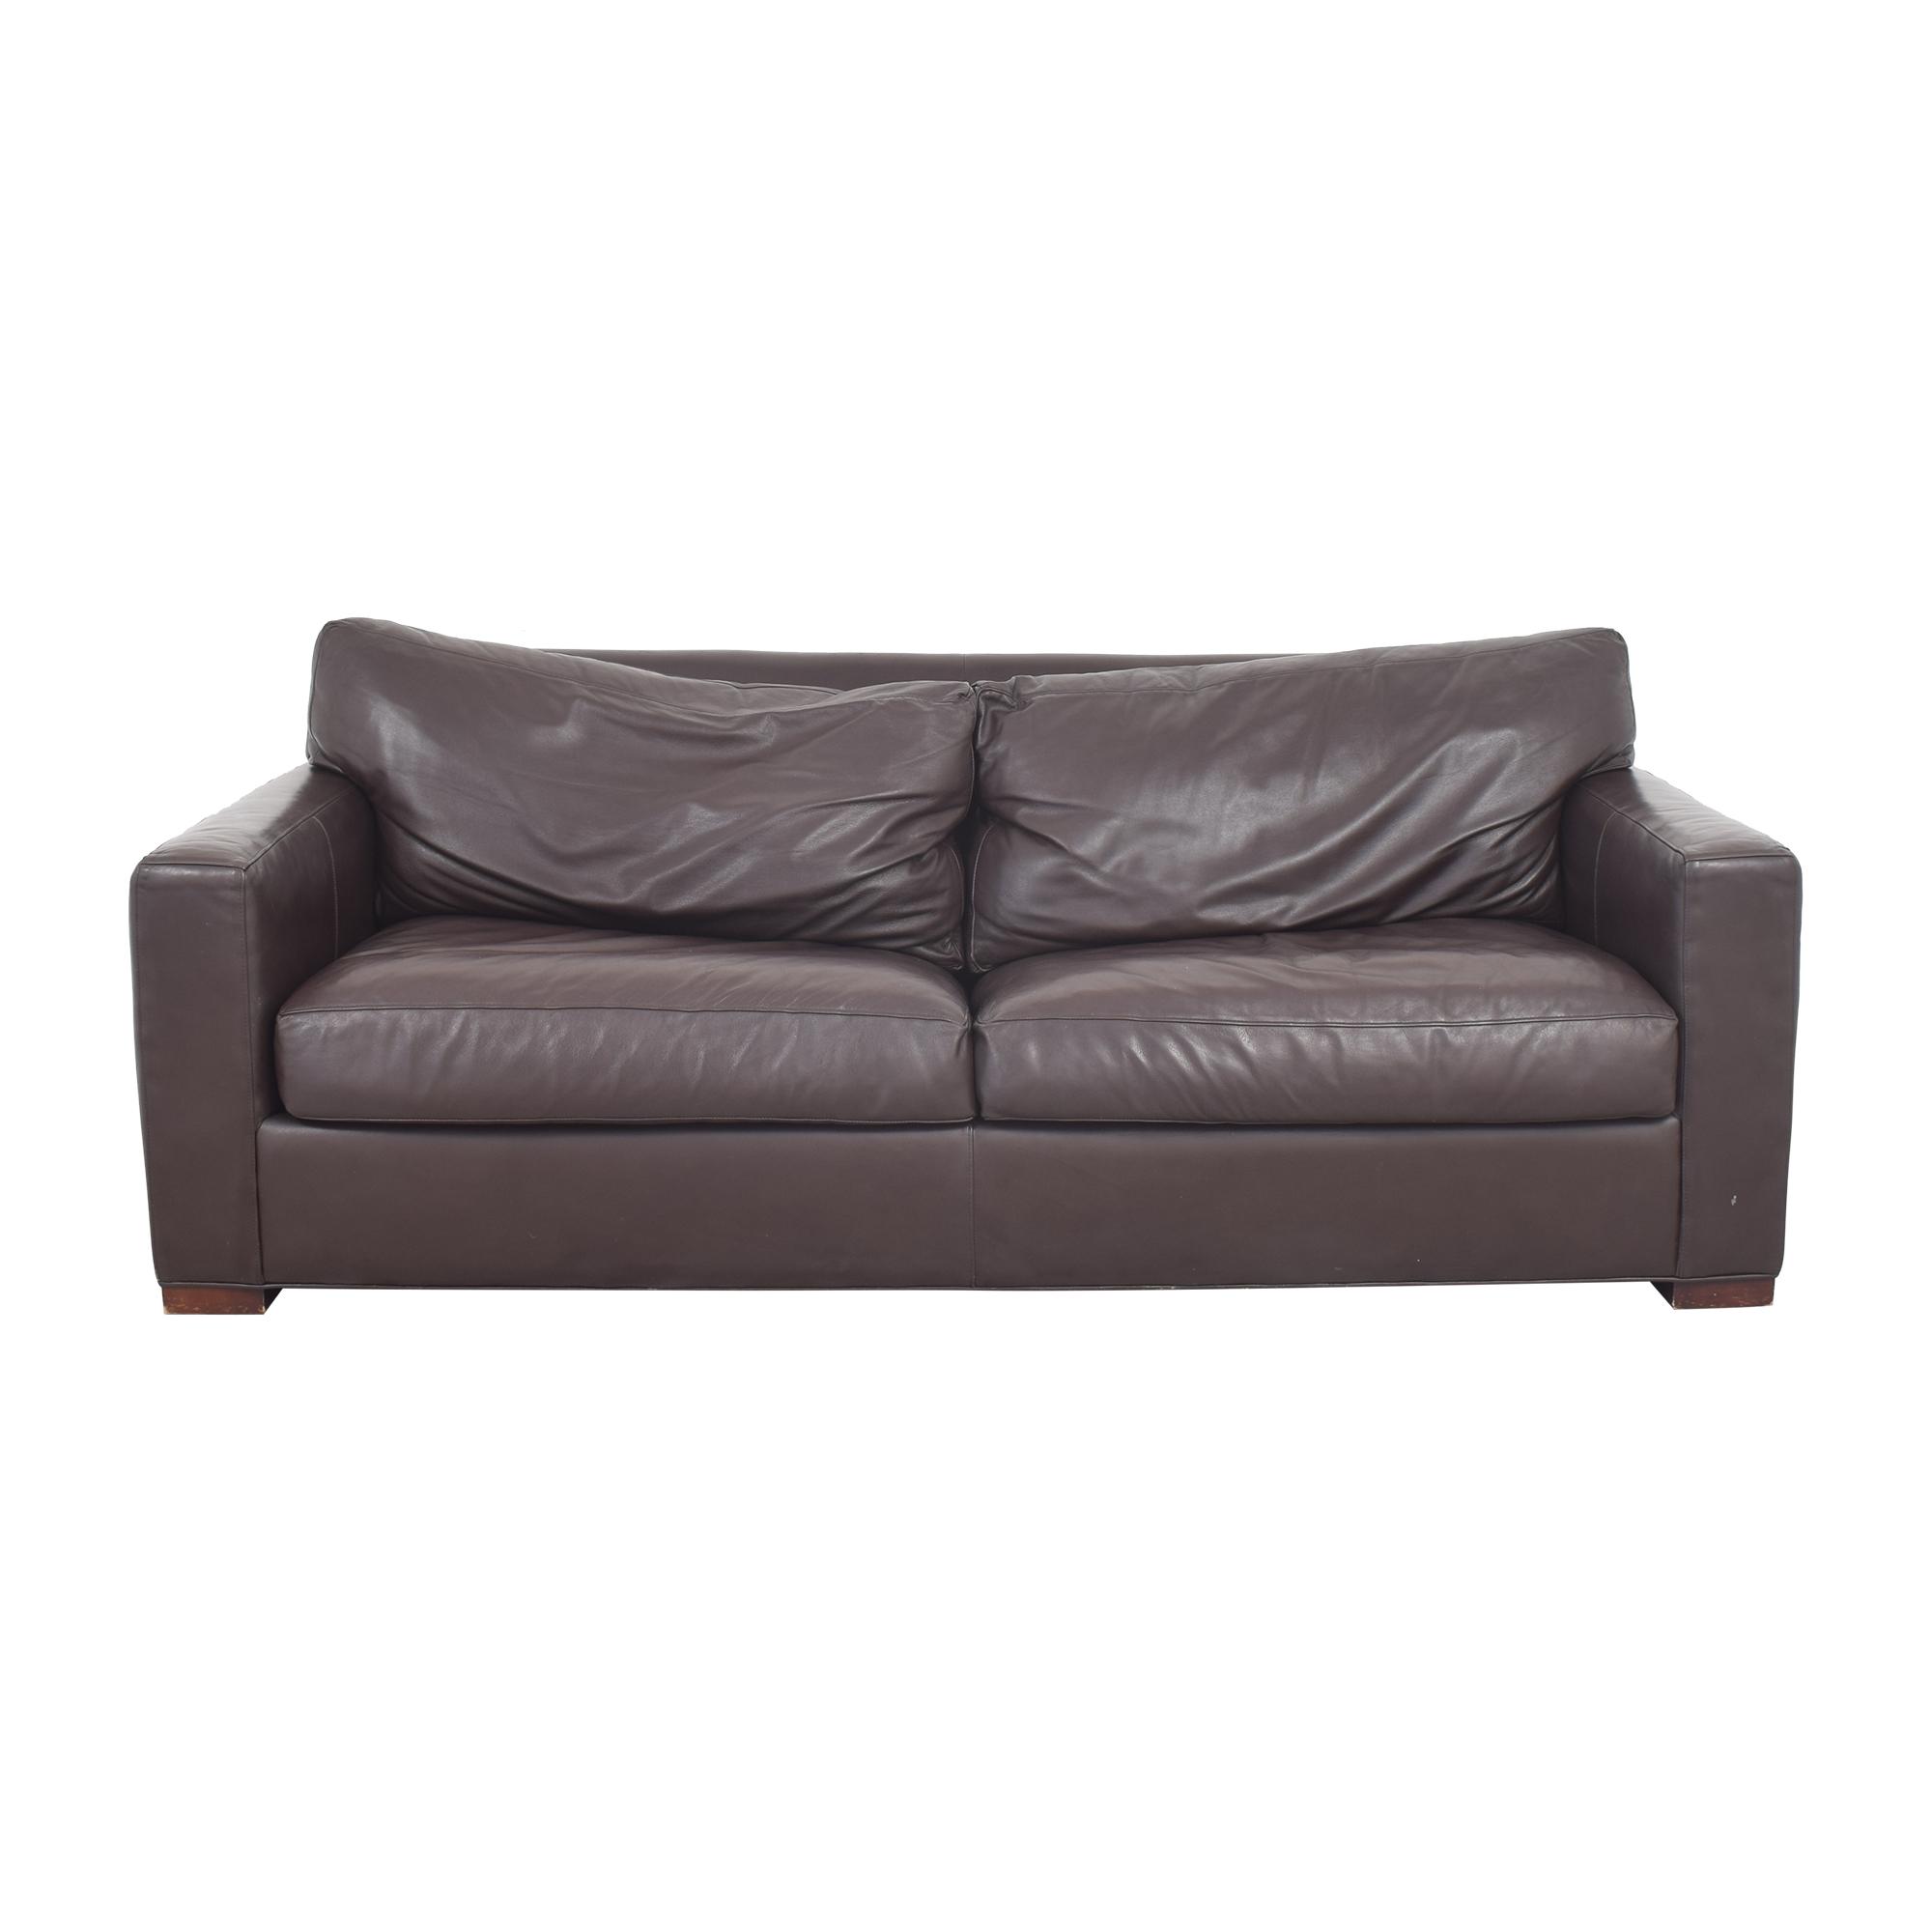 Crate & Barrel Axis II Two Seat Queen Sleeper Sofa / Sofa Beds